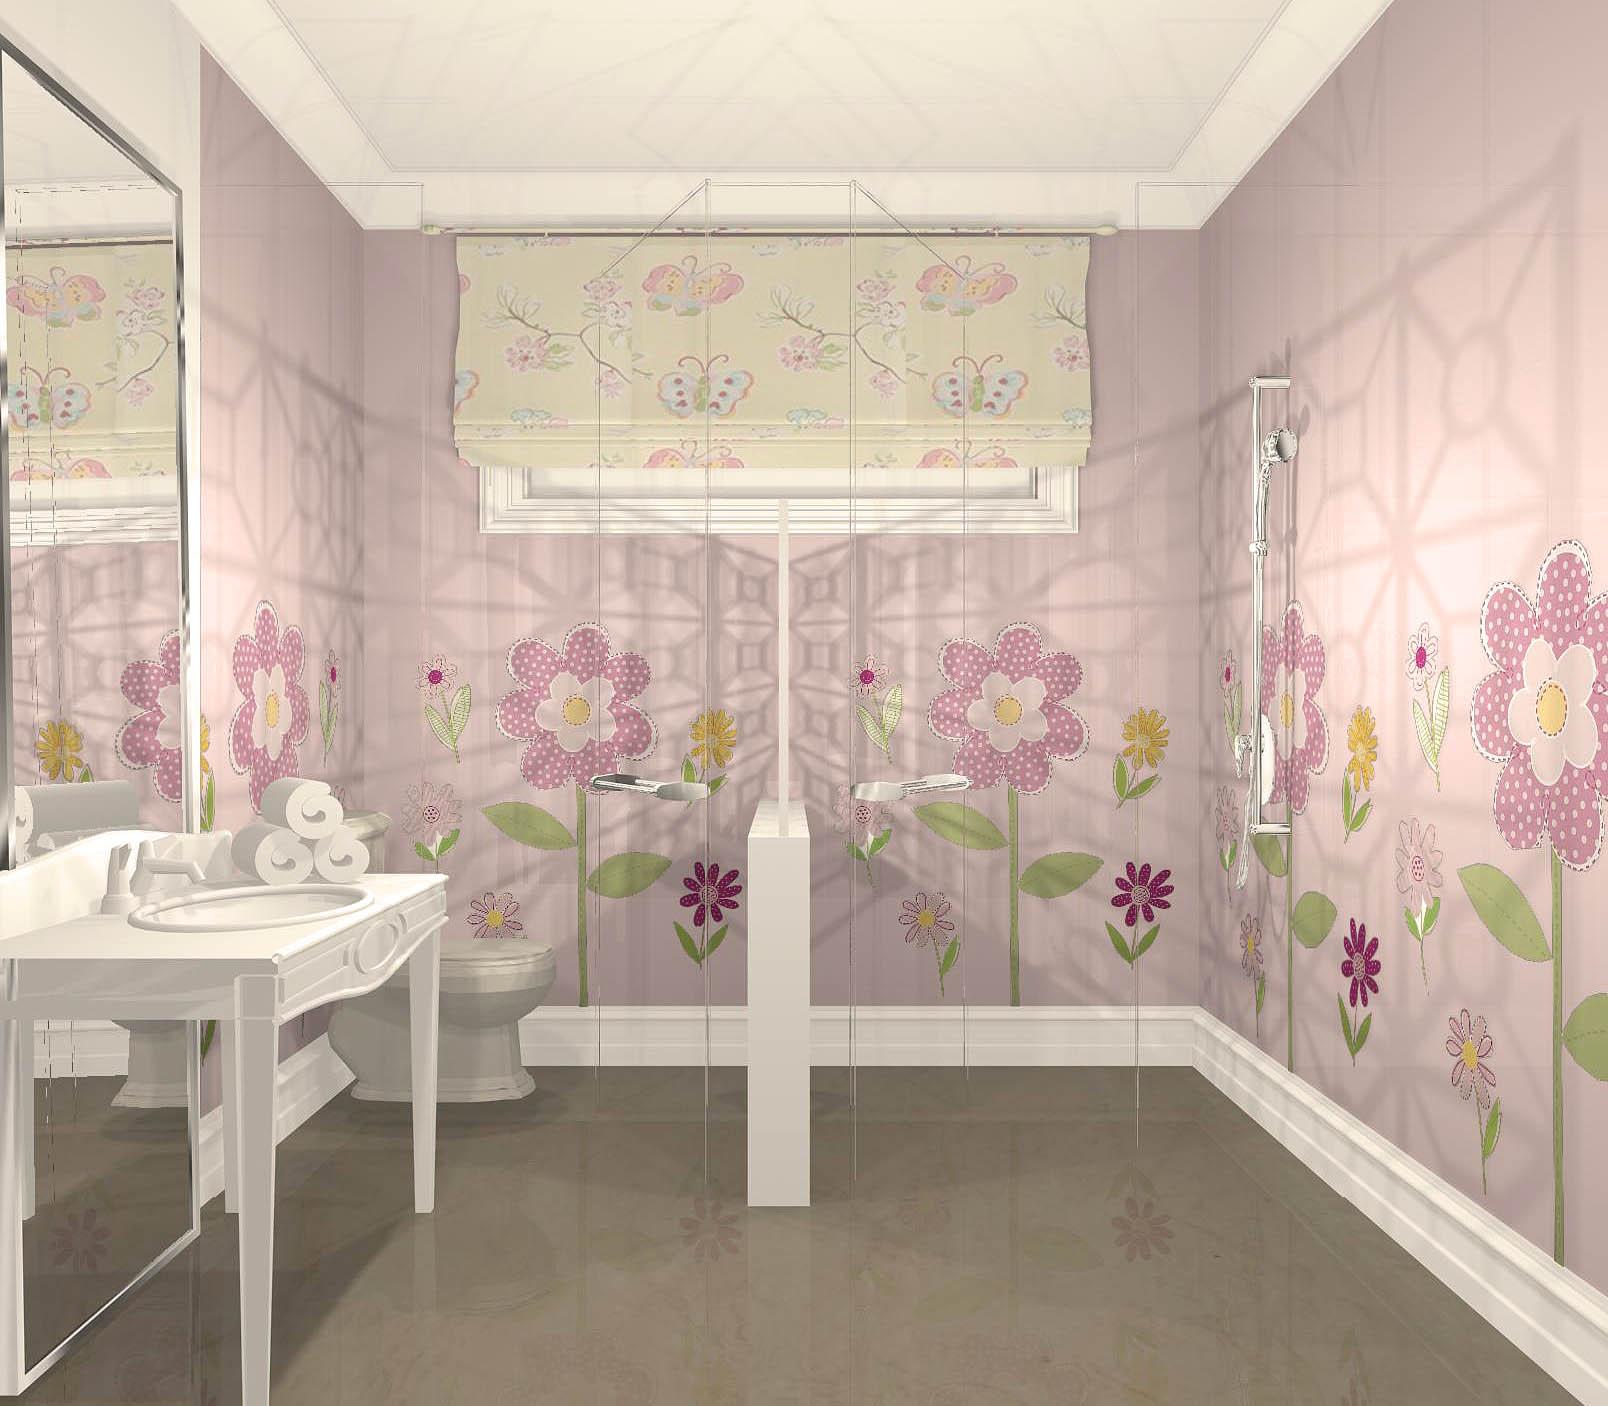 Desain interior kamar mandi anak laki - laki minimalis, jasa desain interior ruang tamu, ruang tamu gaya minimalis klasik, ruang tamu mewa, ruang tamu bergaya minimalis eropa, ruang tamu skandinavian, desain interior rumah minimalis, desain interior rumah minimalis klasik